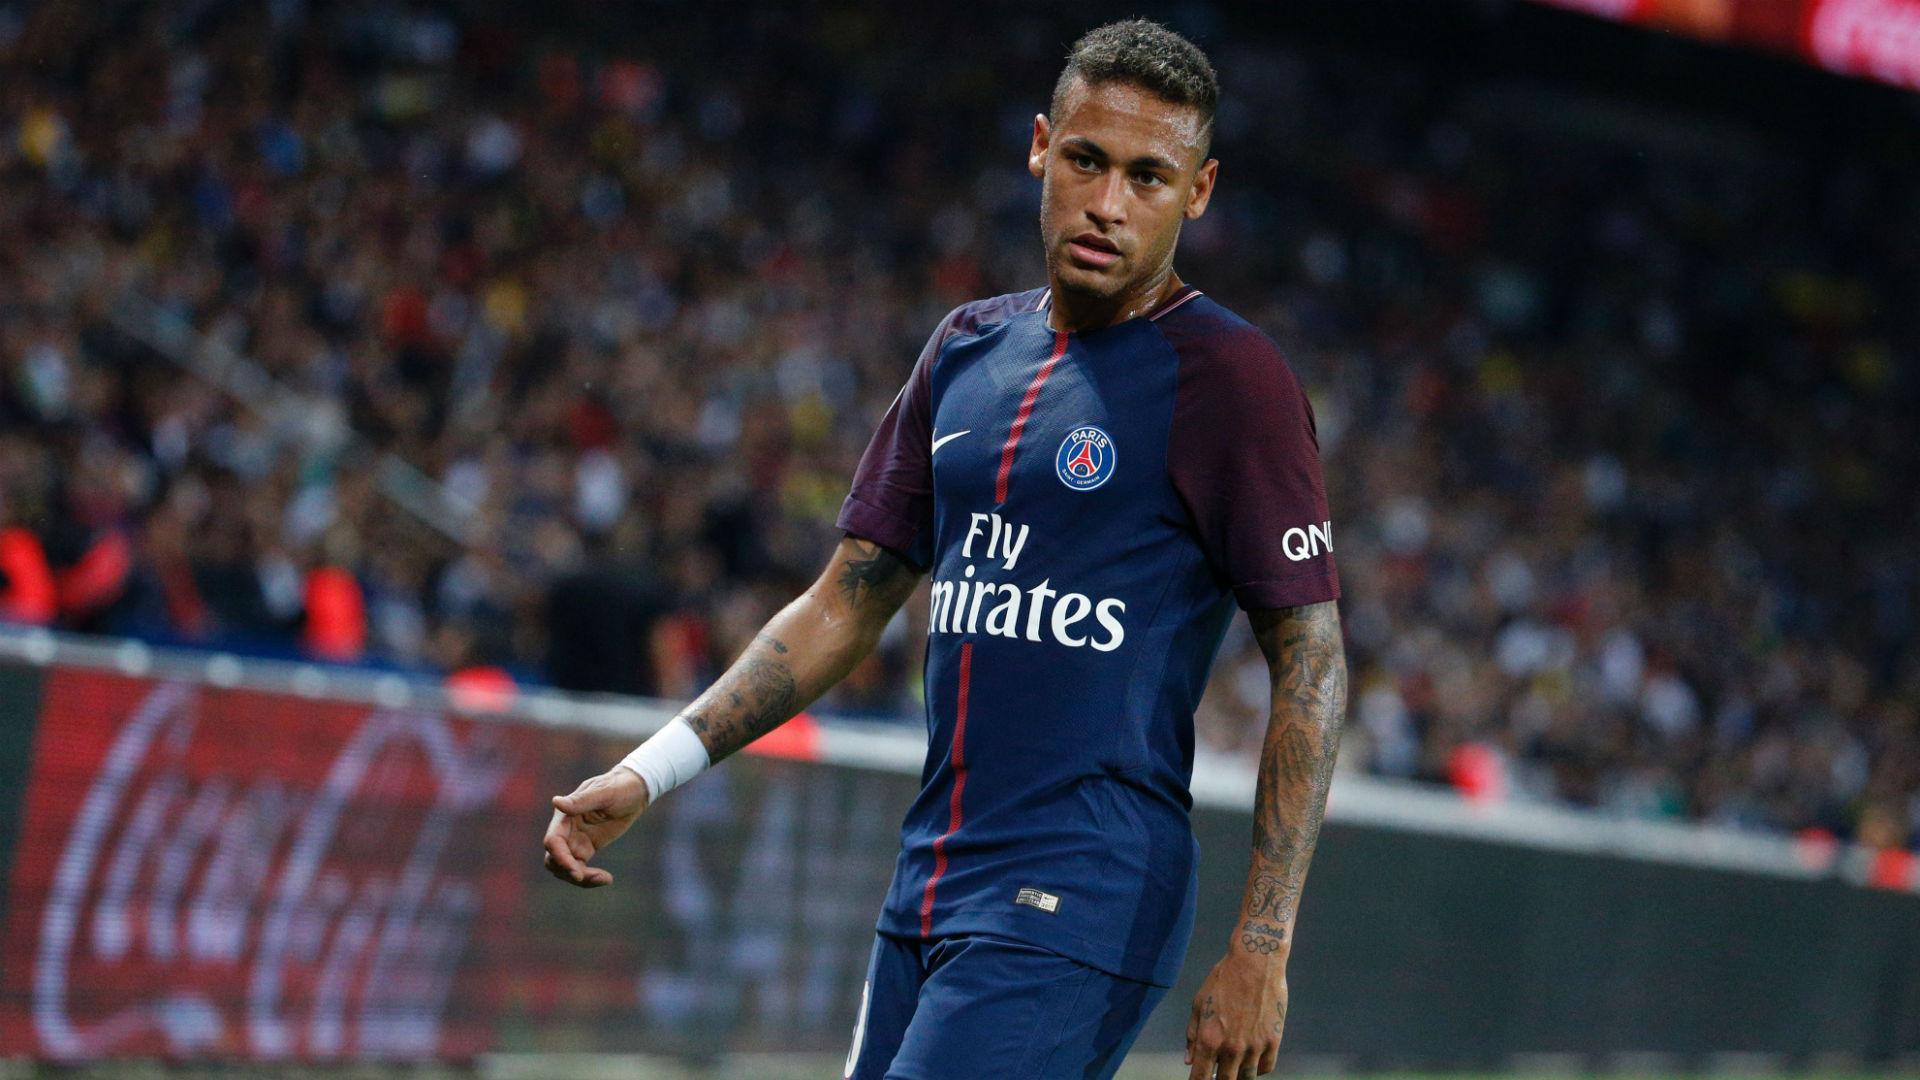 Neymar PSG ASSE Ligue 1 25082017